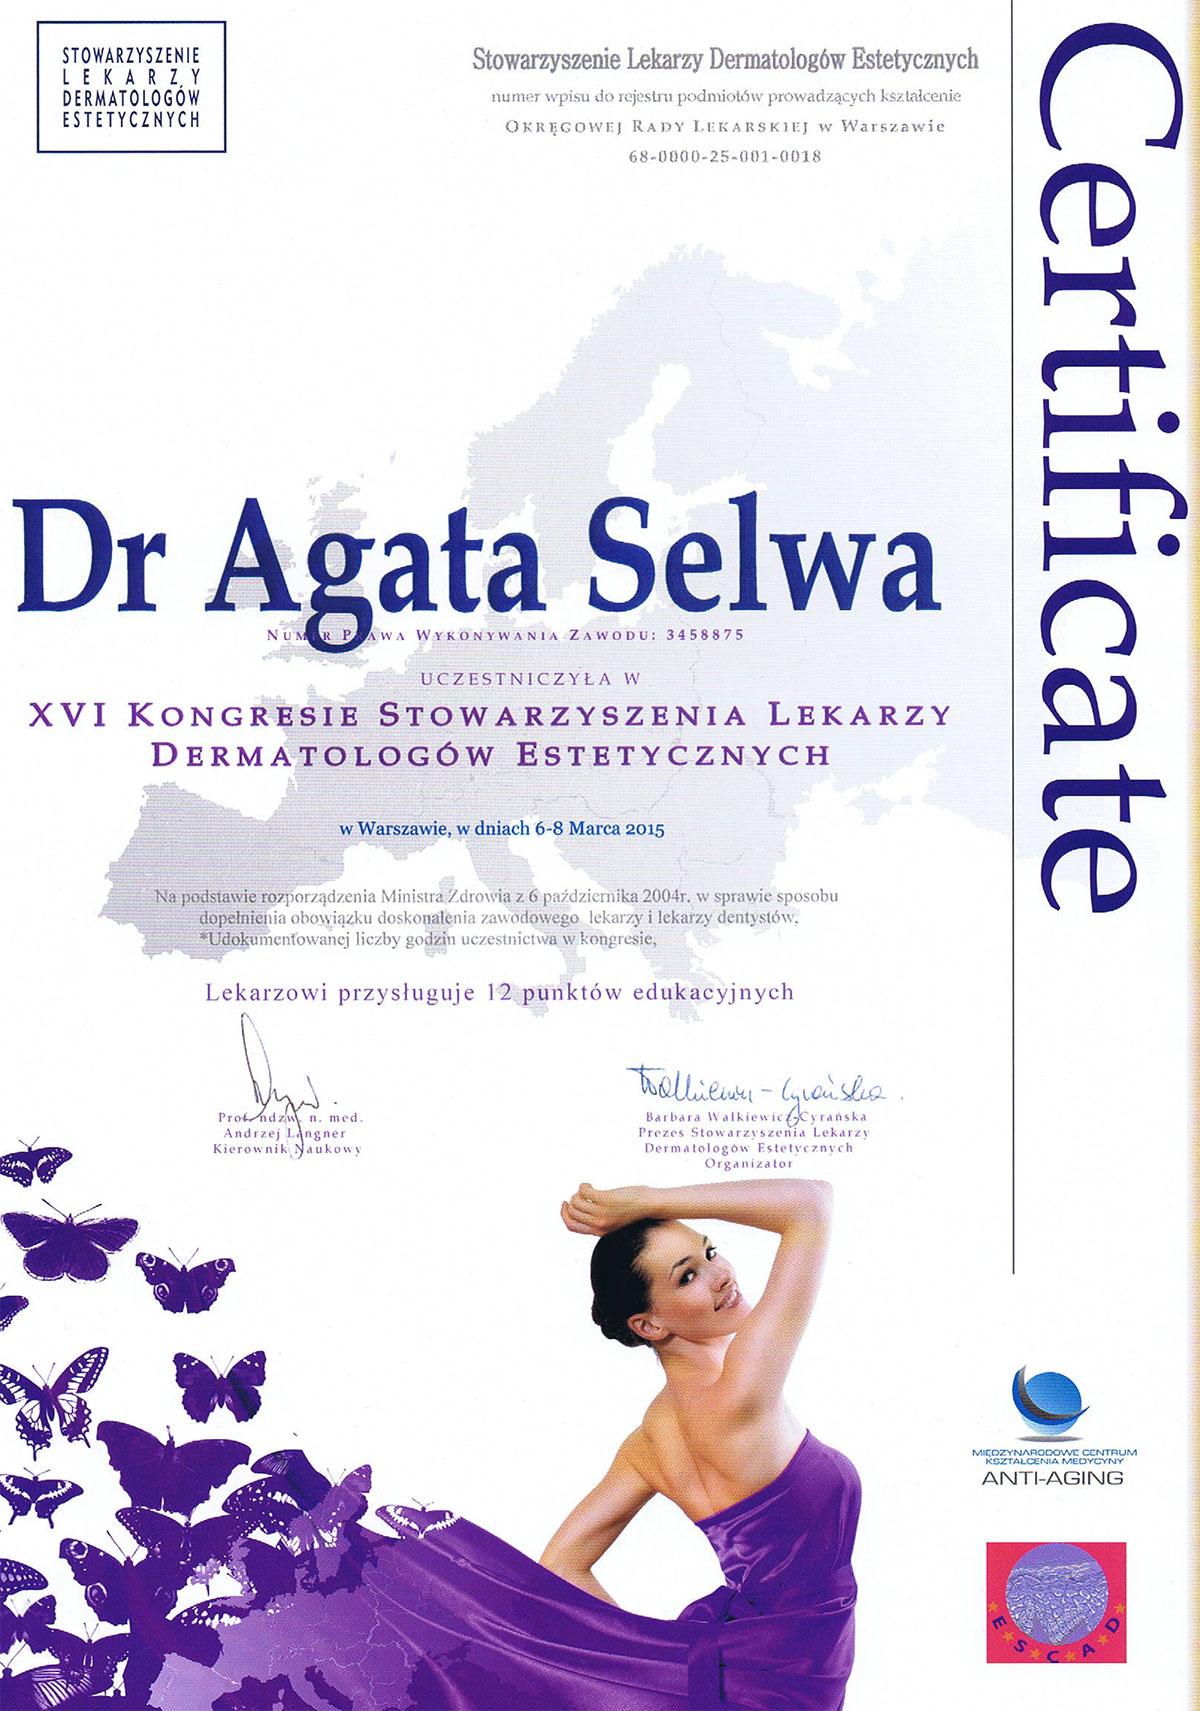 certyfikat lekarz dermatolog estetyczny dr agata selwa